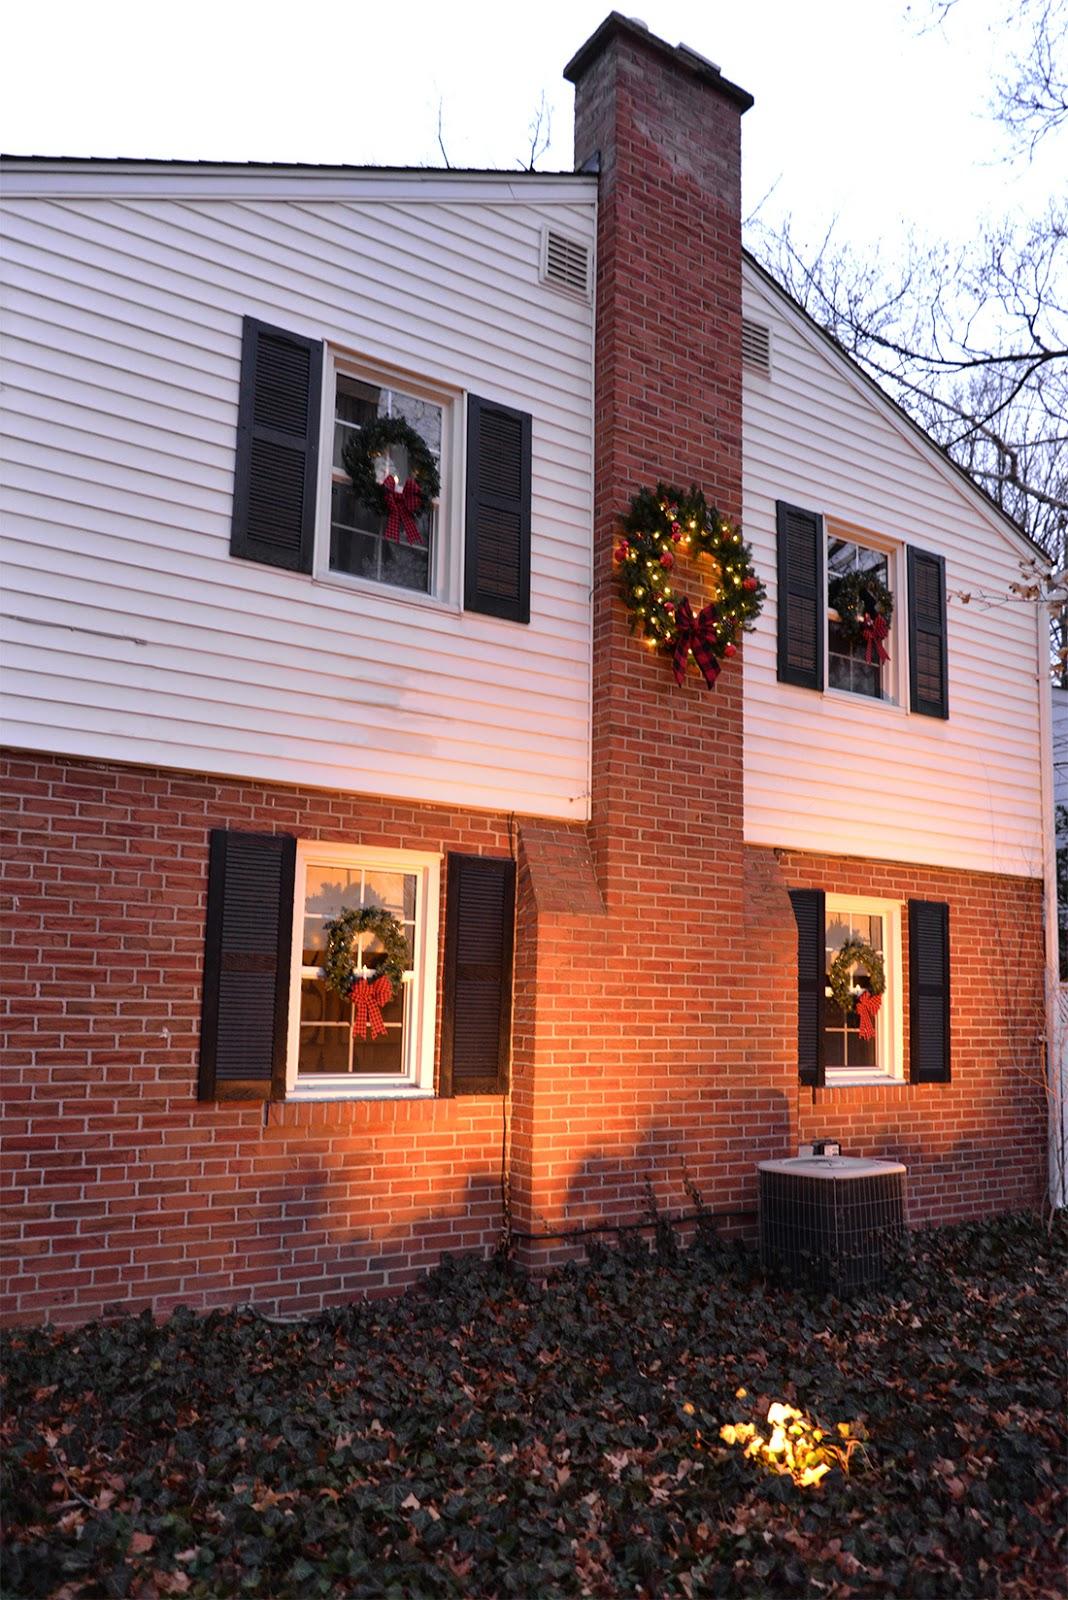 wreath on chimney, wreaths on every window, candles in window wreaths